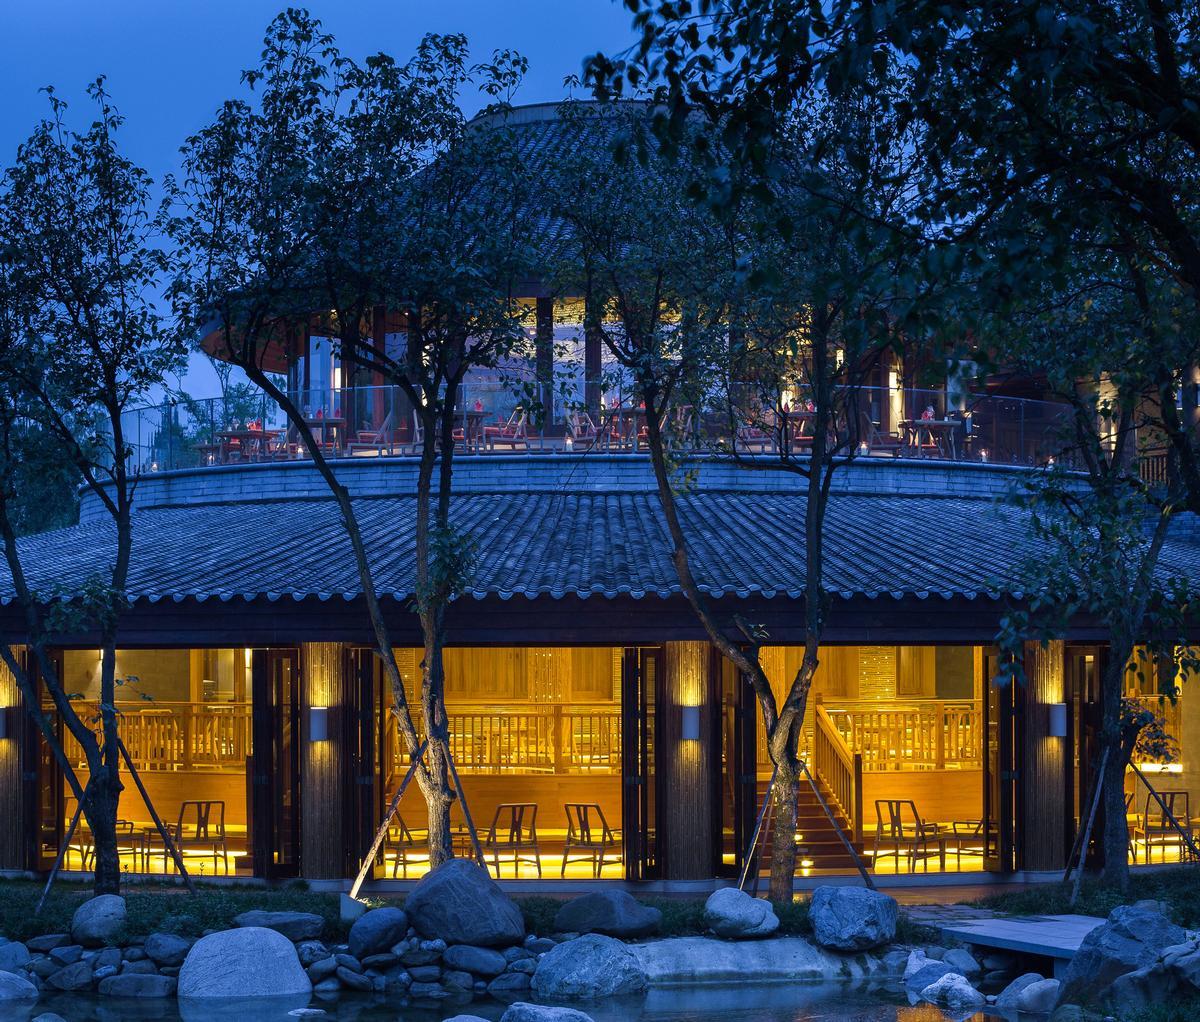 The Moon Bar at Six Senses Qing Cheng Mountain / Six Senses